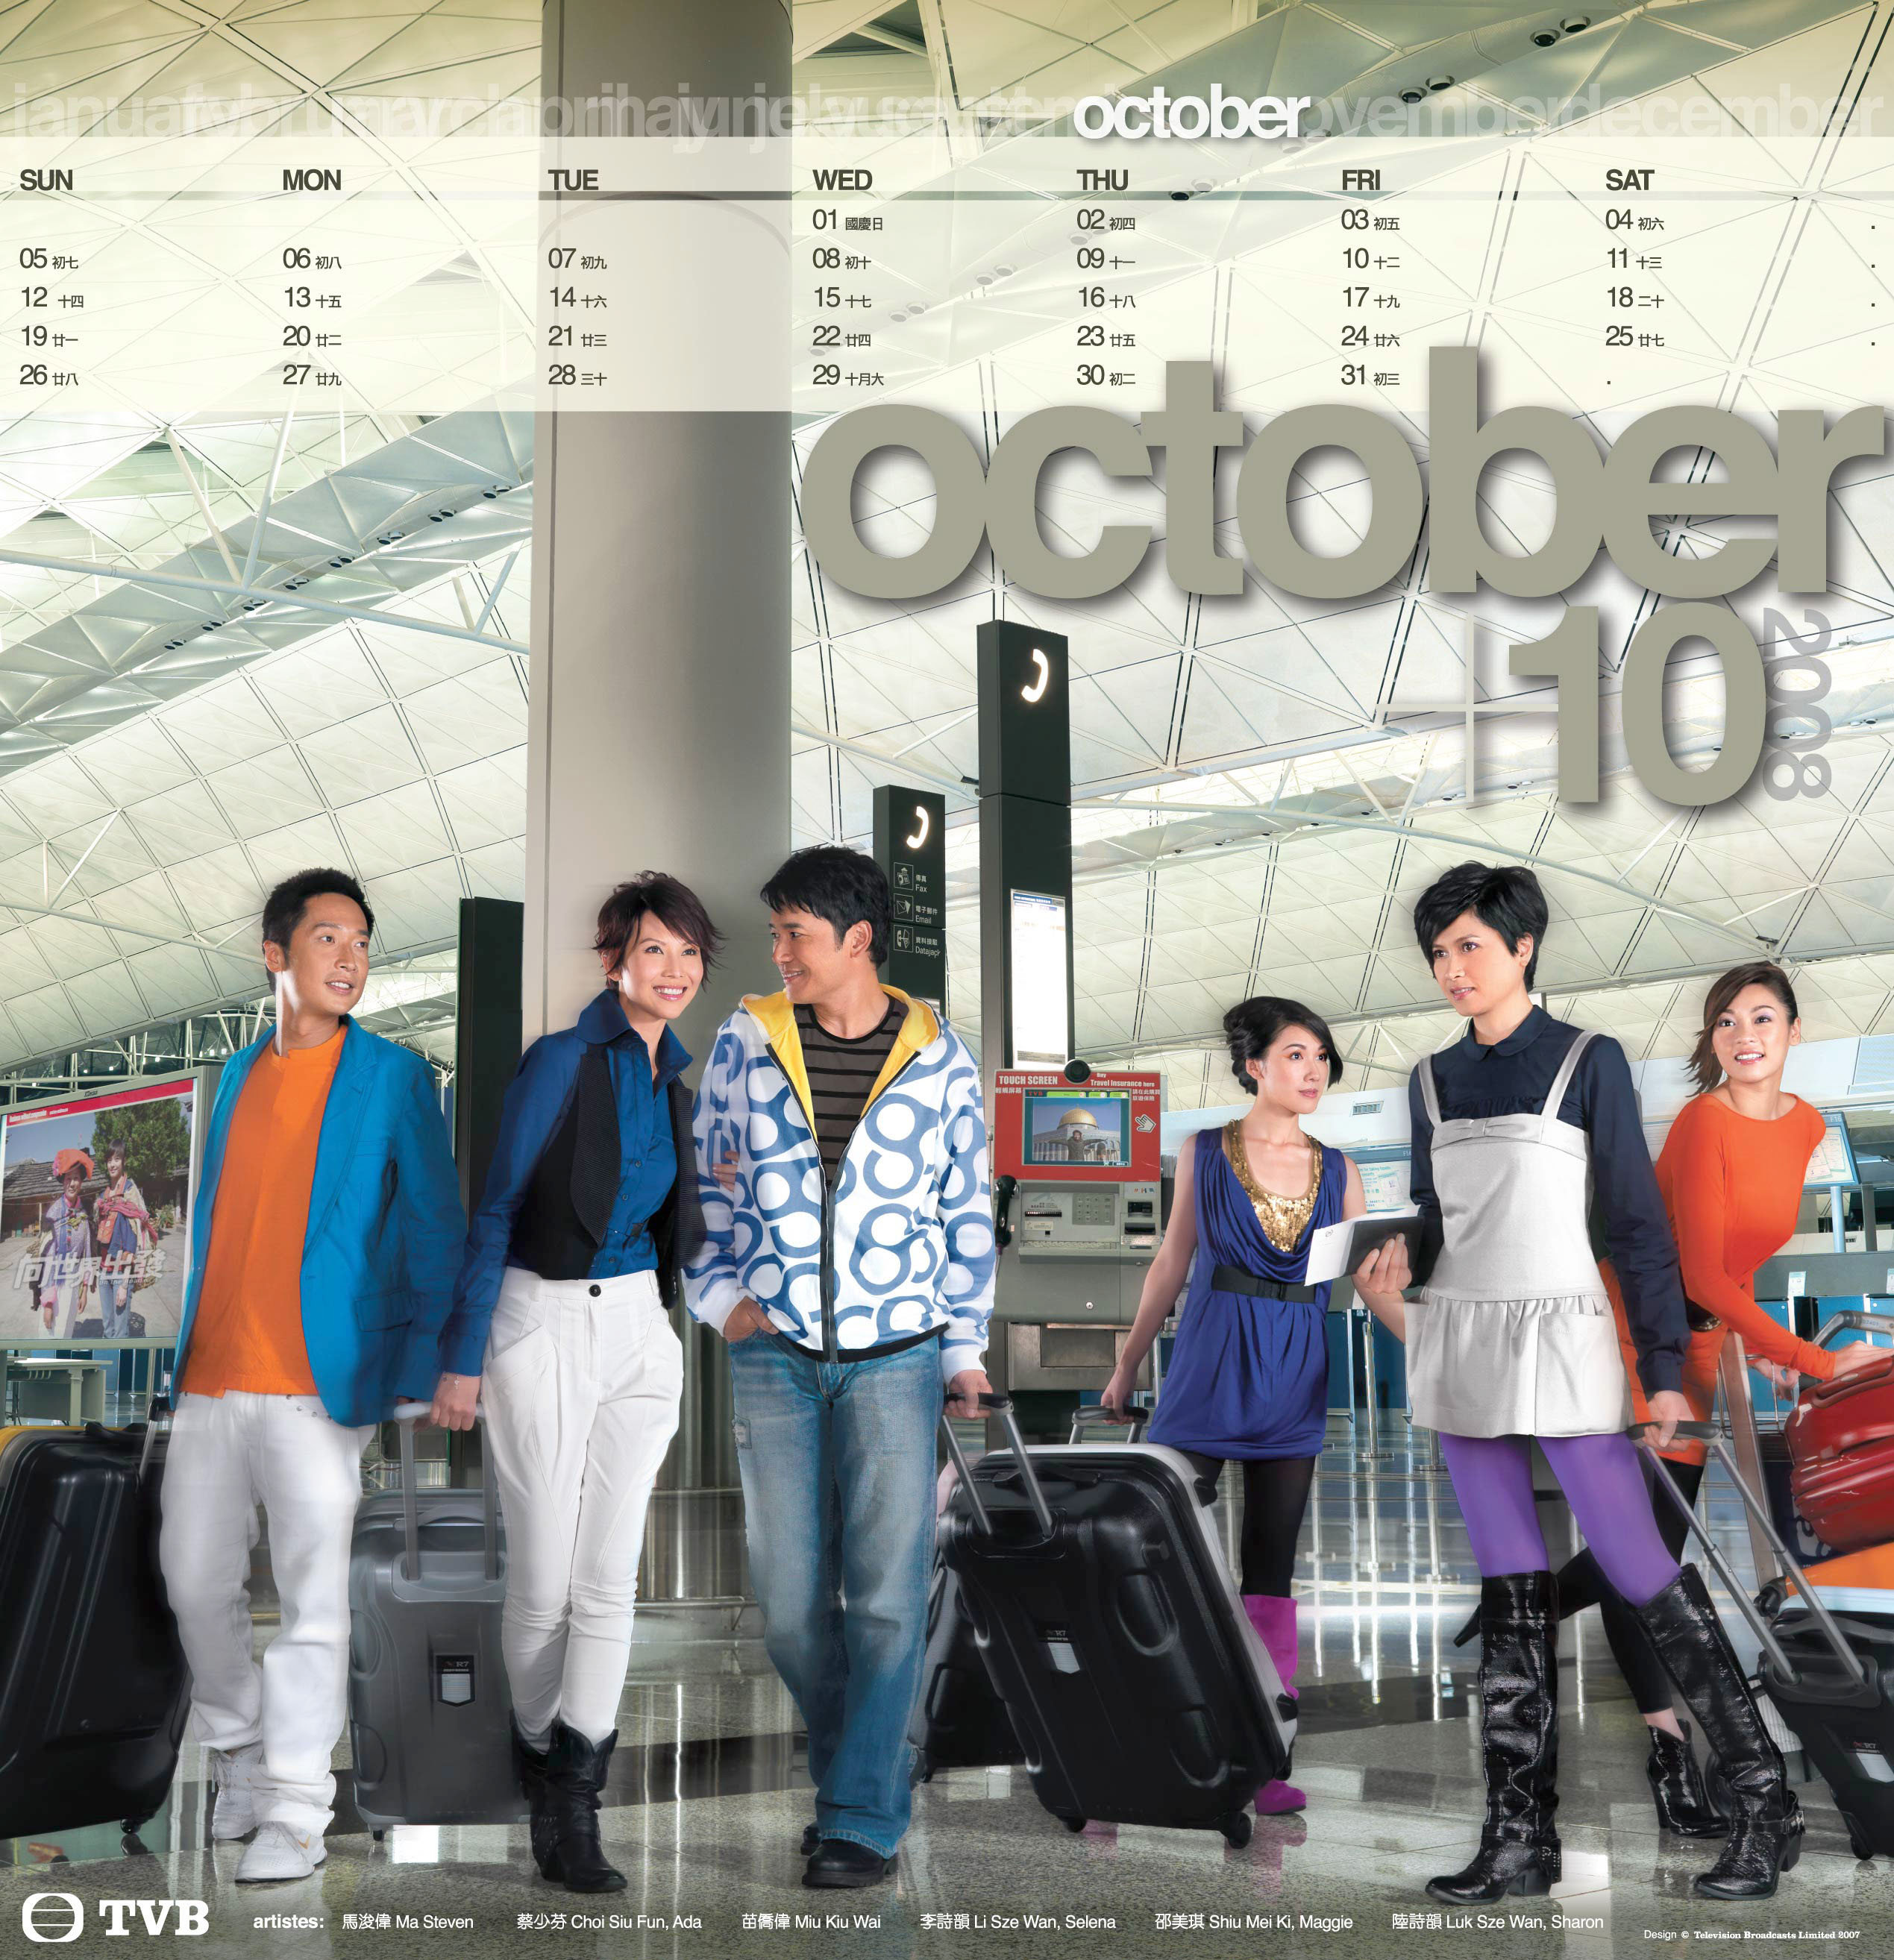 Hong Kong TVB calendar October 2008